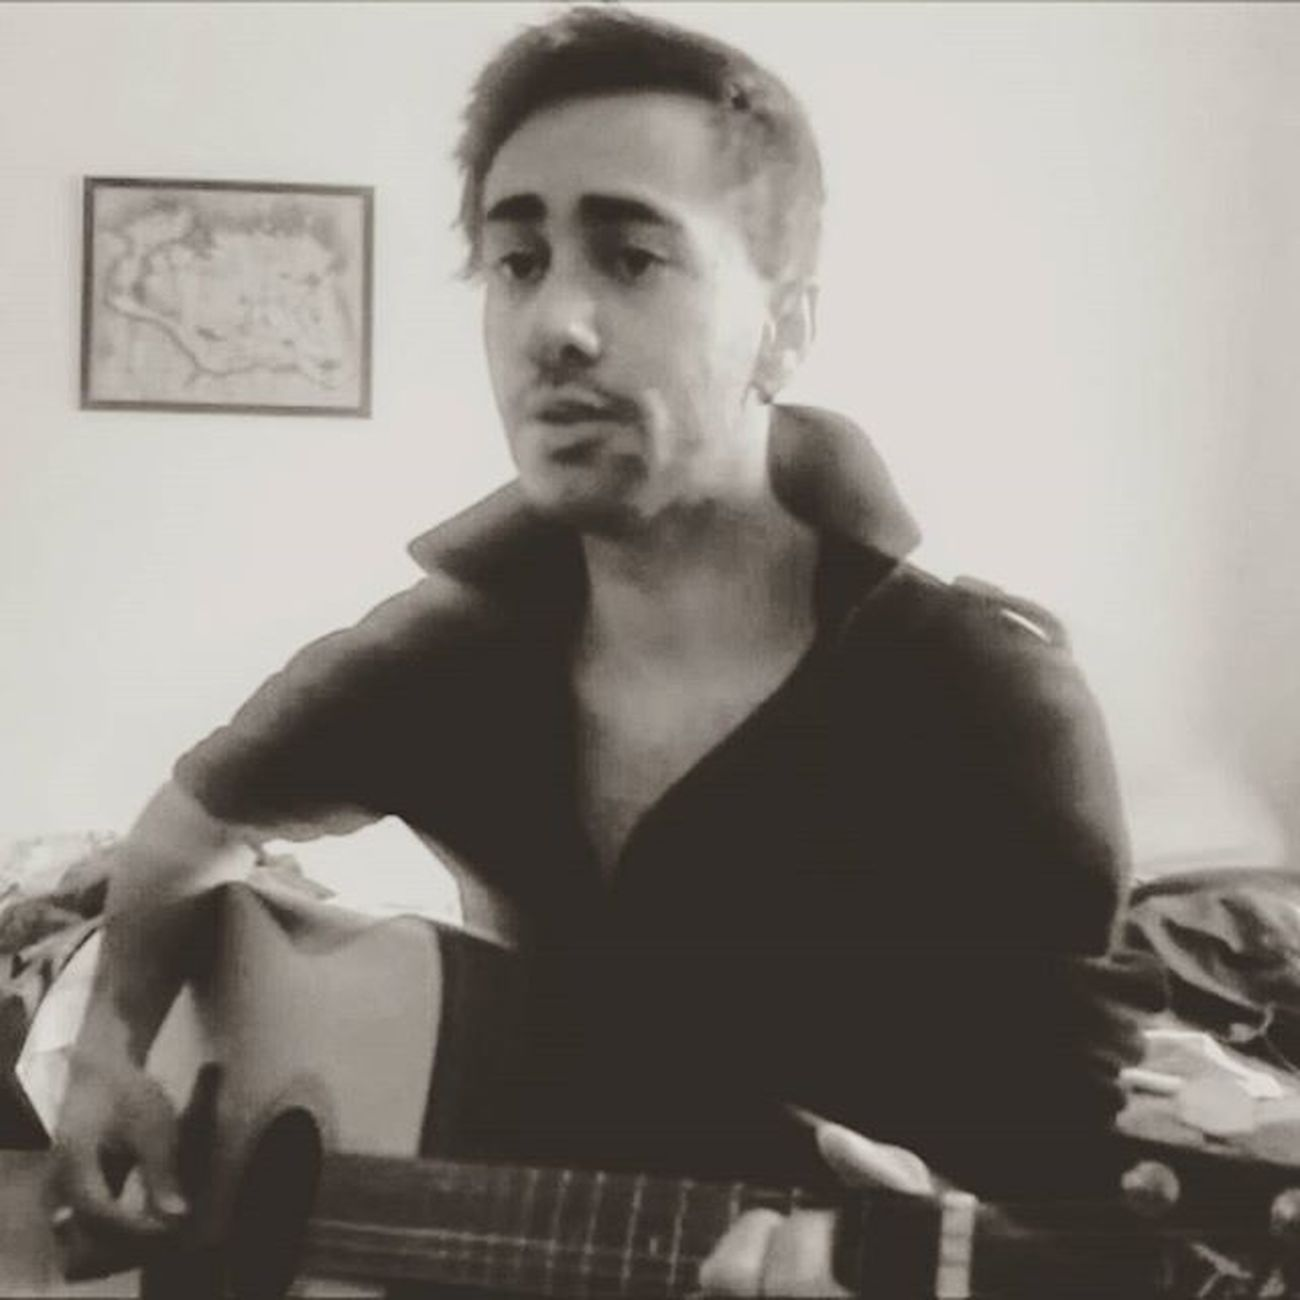 2013 Brendan Serenades Youtube with Hallelujah